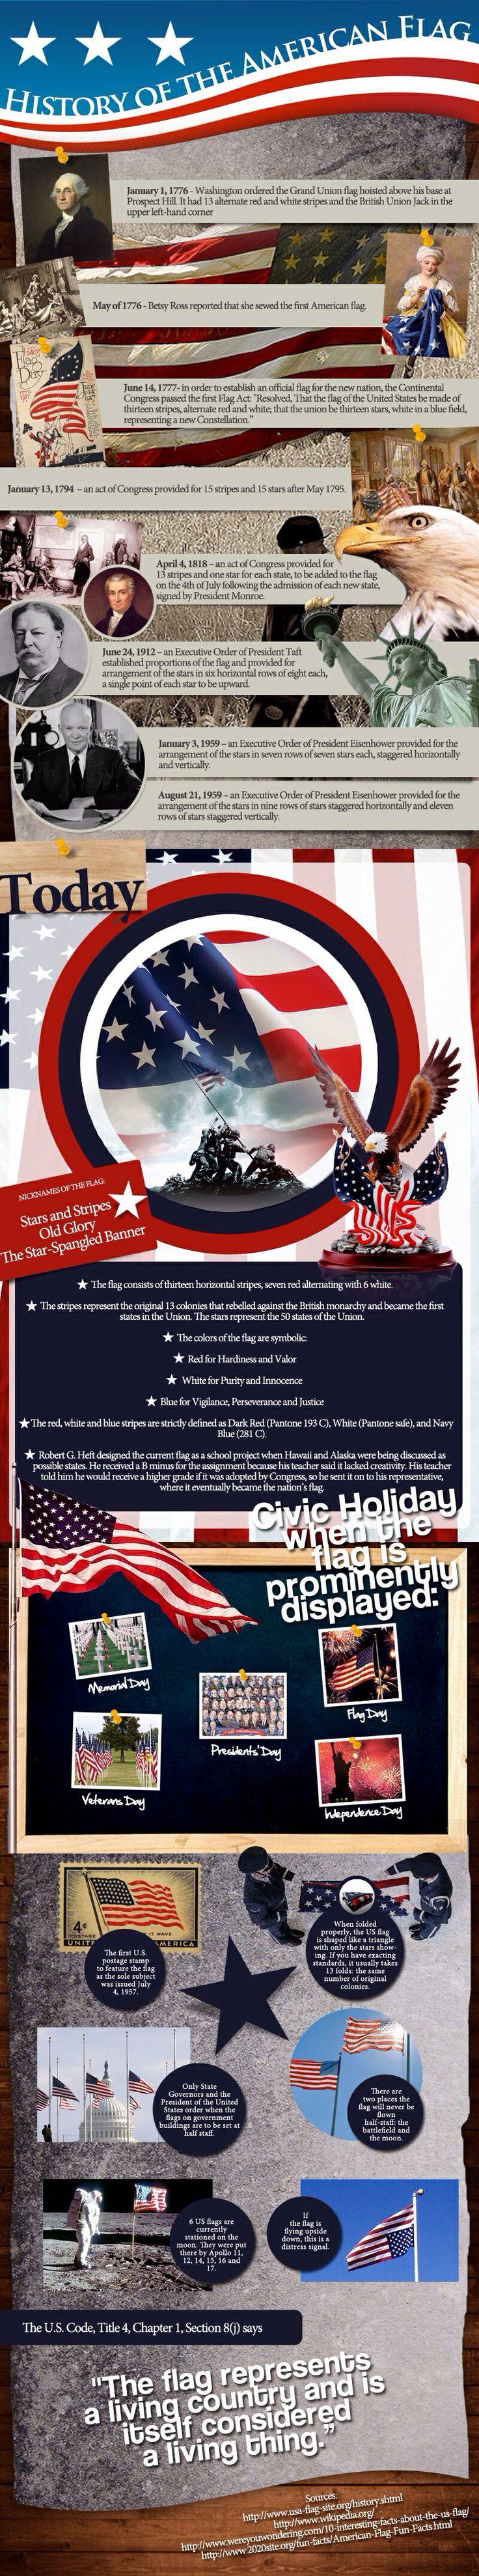 best 25 us flag history ideas on pinterest history of american